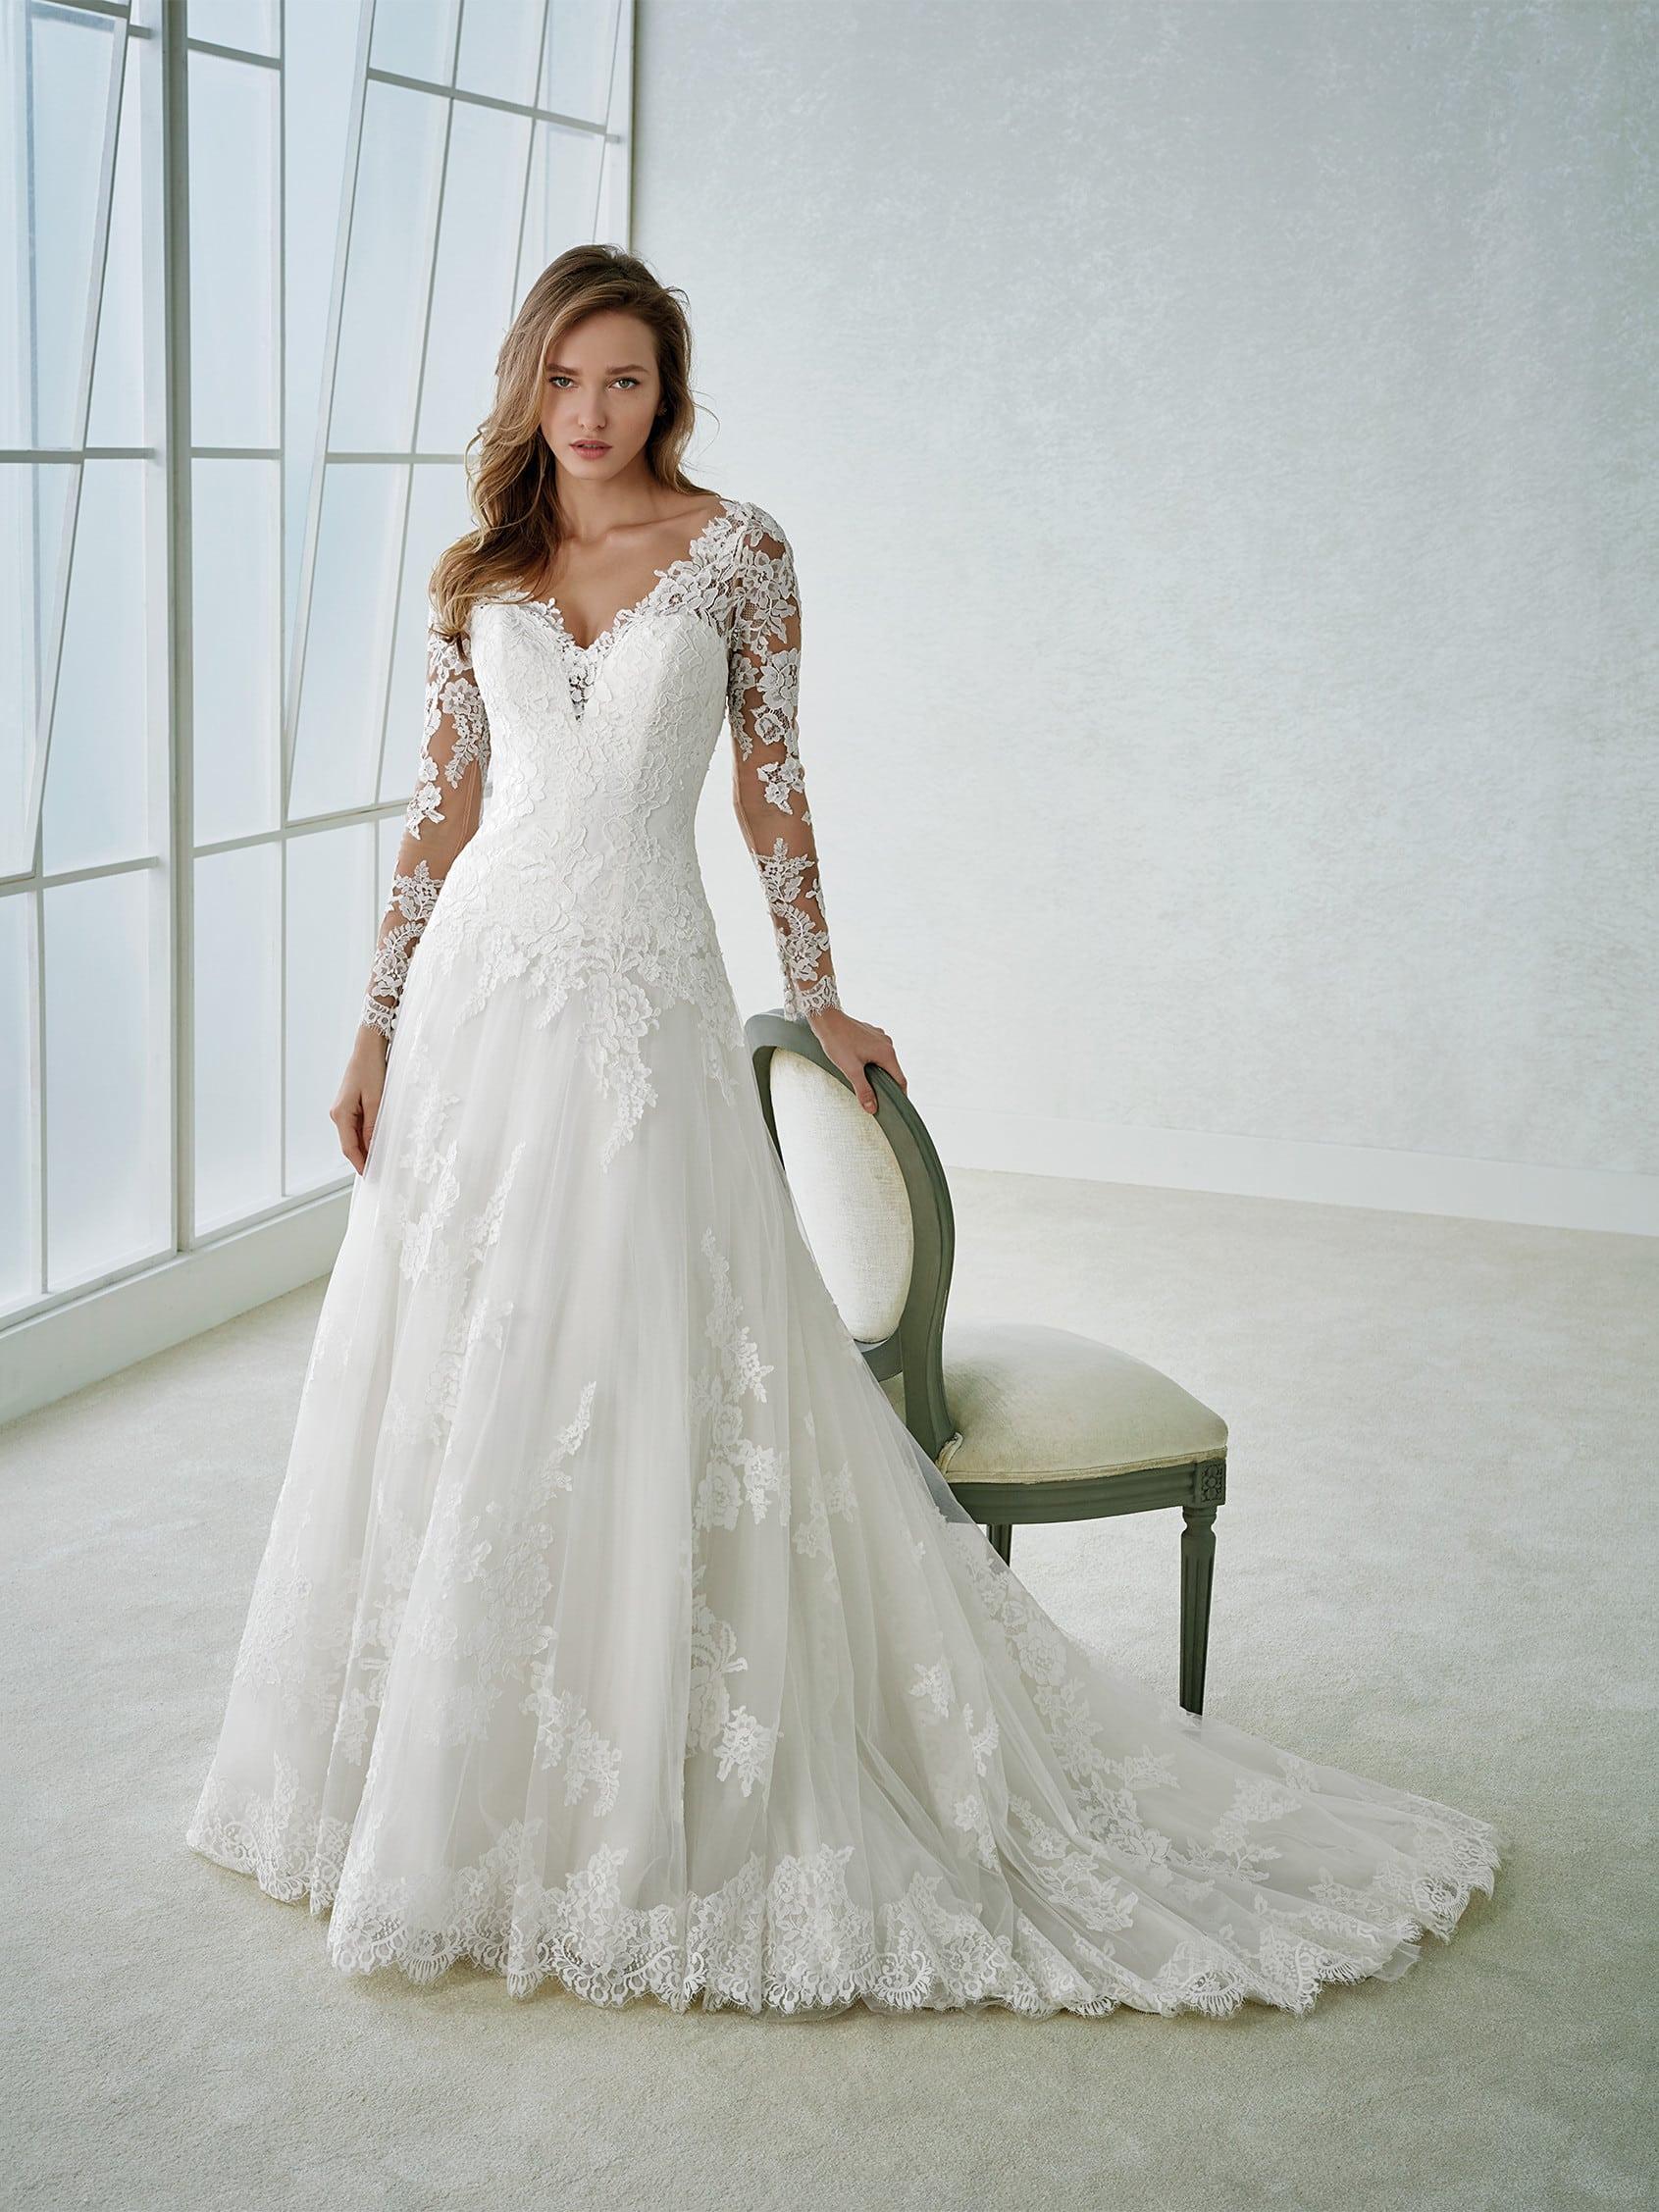 Robe de Mariée White one Fabria Collection 2018